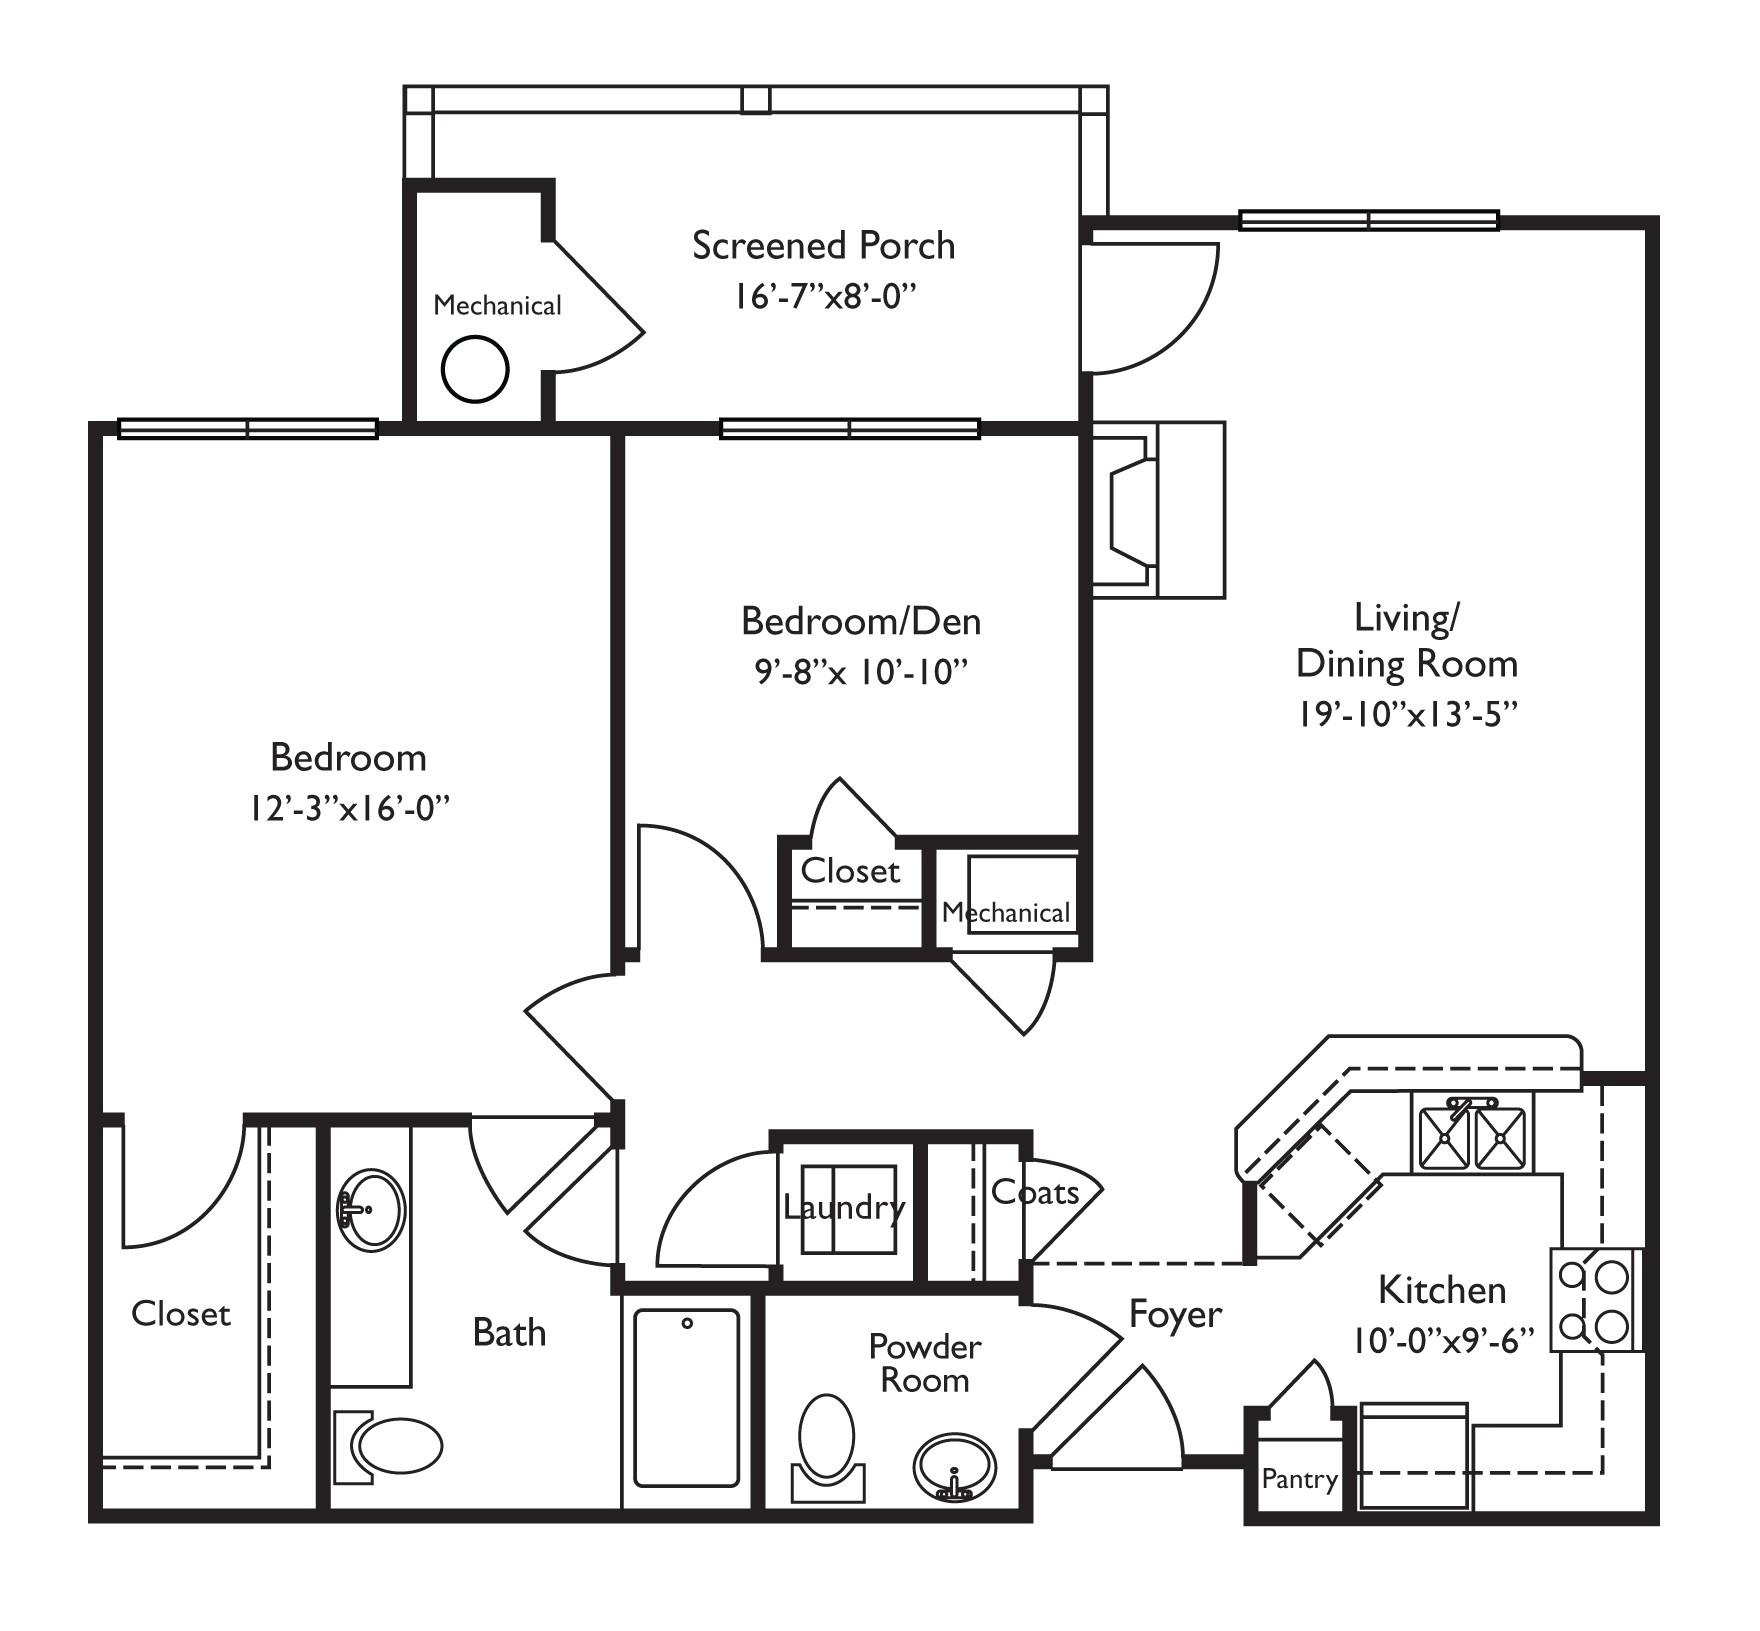 retirement home floor plans inspirational floor plans for retirement homes looks wheelchair accessible